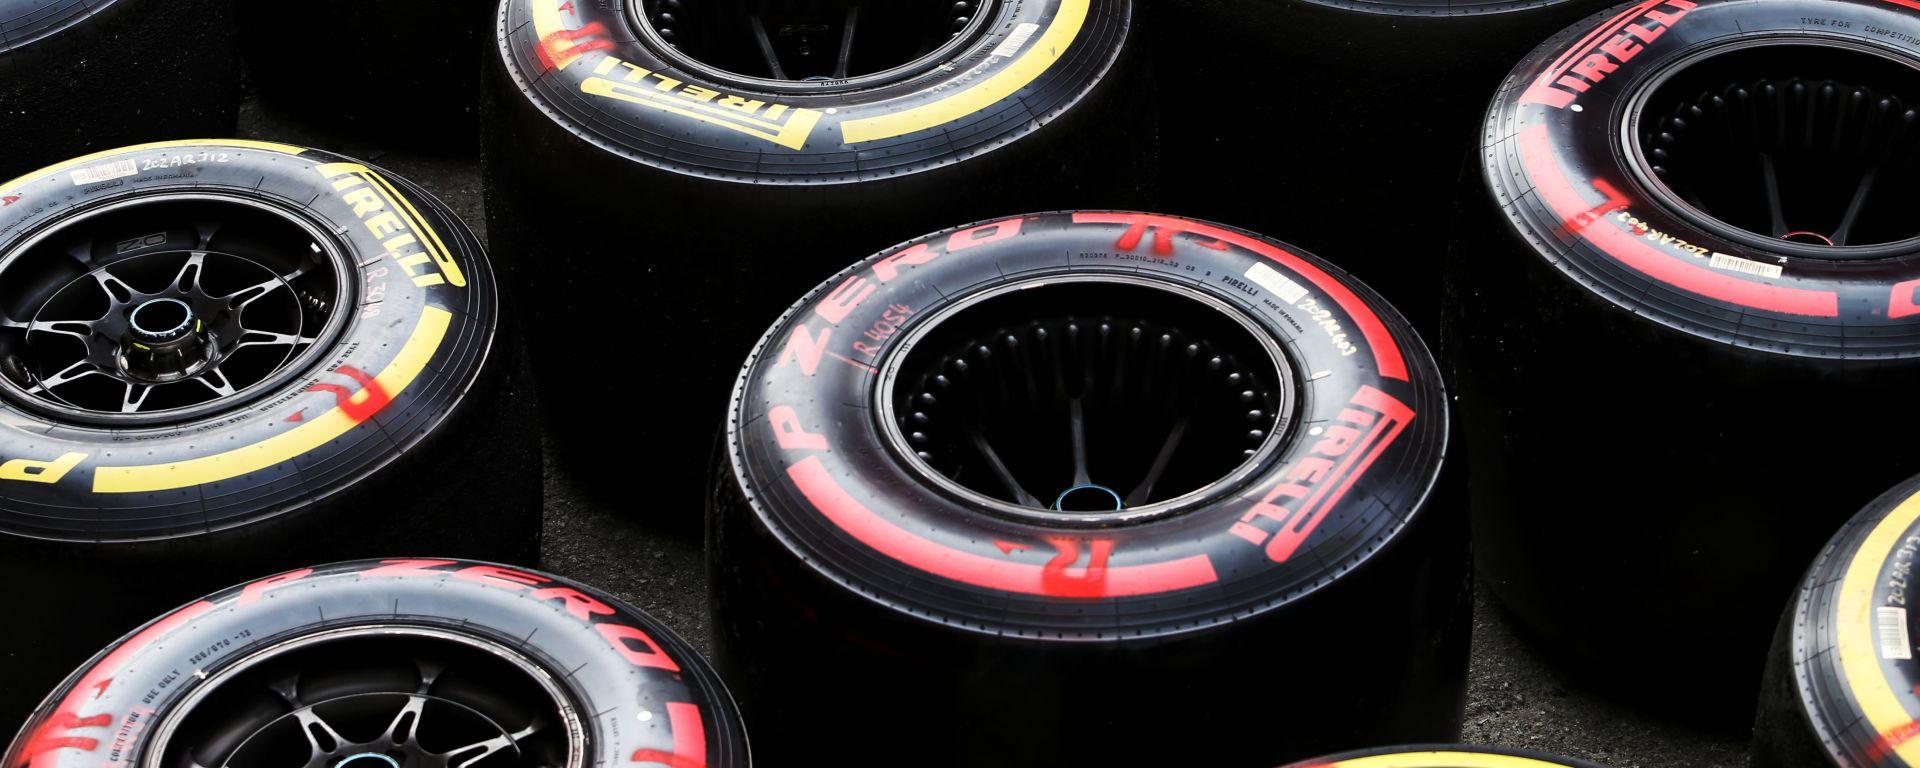 F1 Test Barcellona 2020: gomme Pirelli nel paddock del Circuit de Catalunya